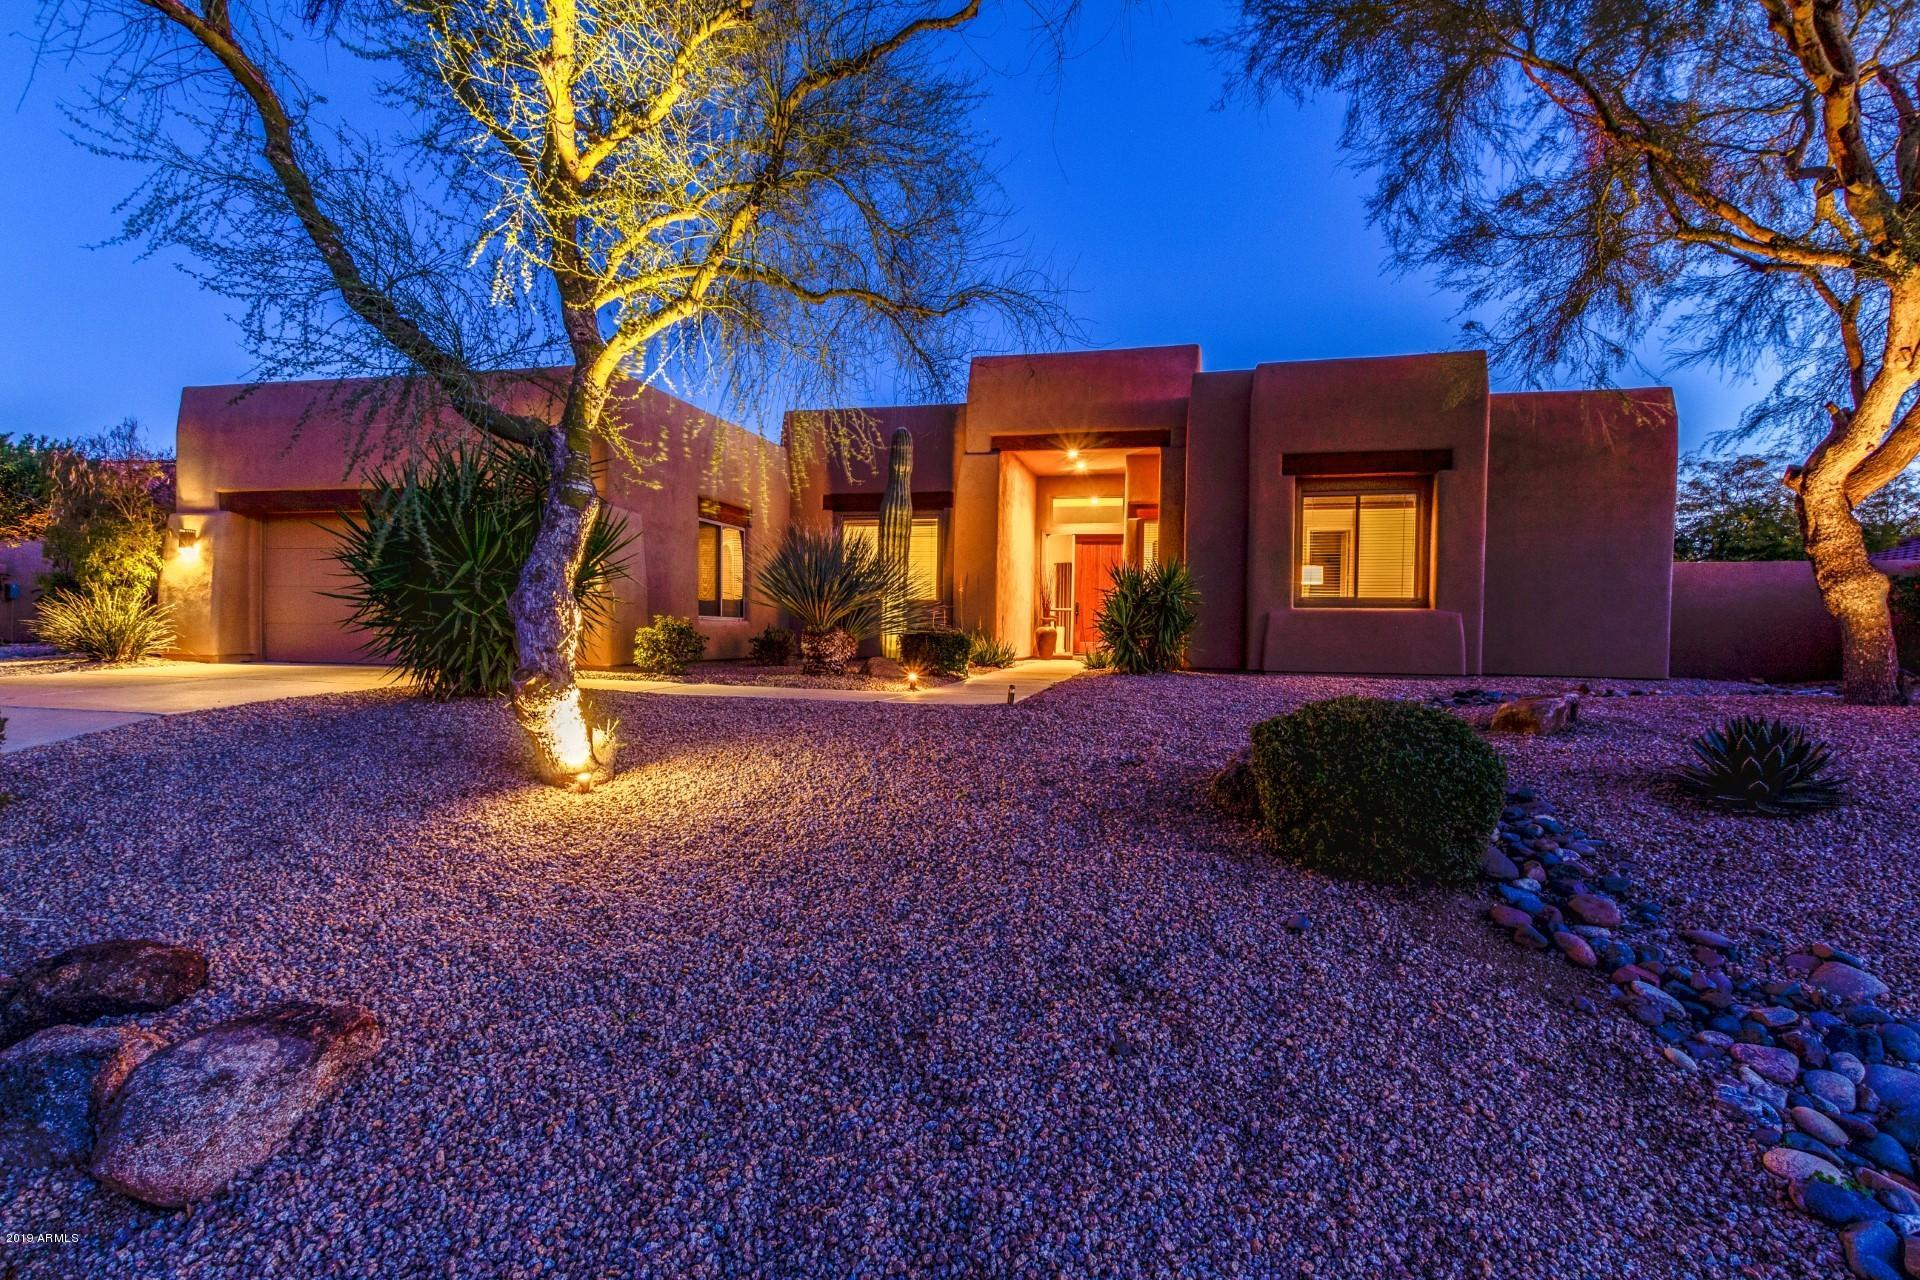 Photo of 9379 E MARK Lane, Scottsdale, AZ 85262